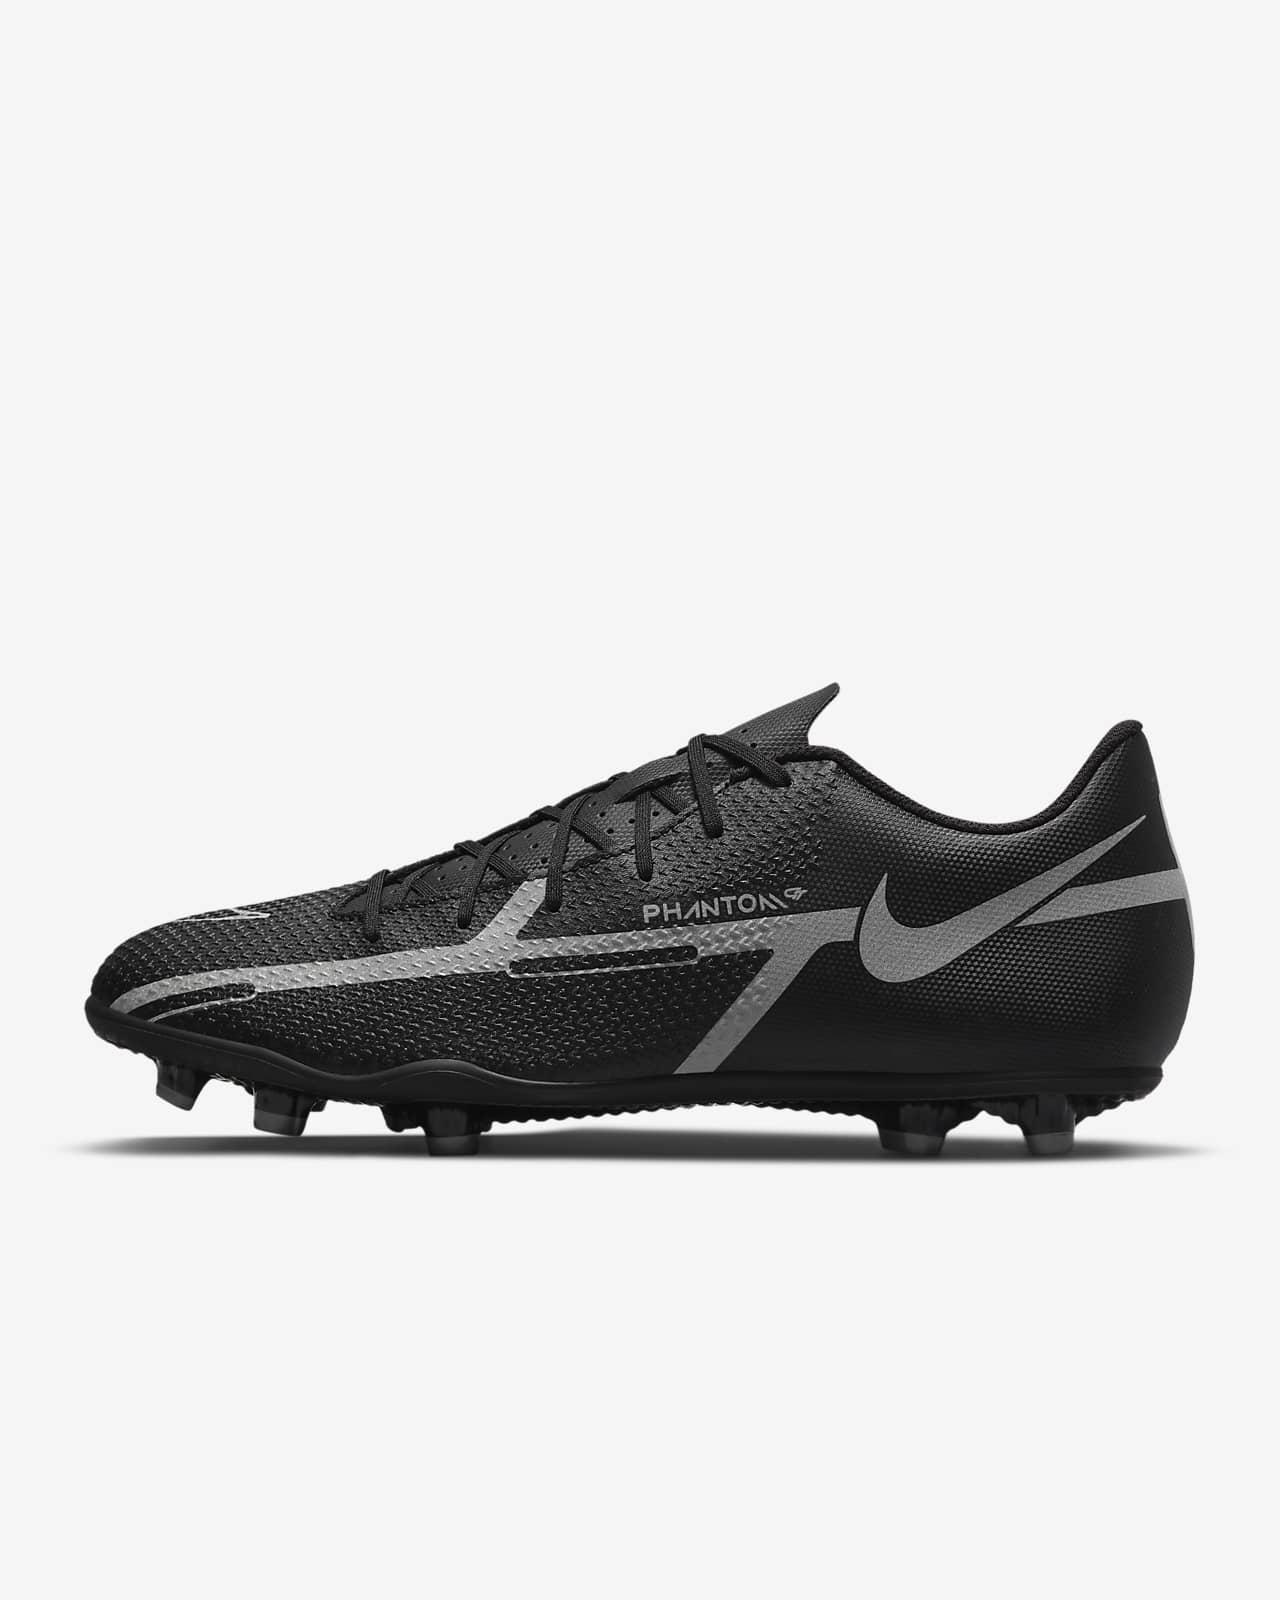 Nike Phantom GT2 Club MG Multi-Ground Soccer Cleat